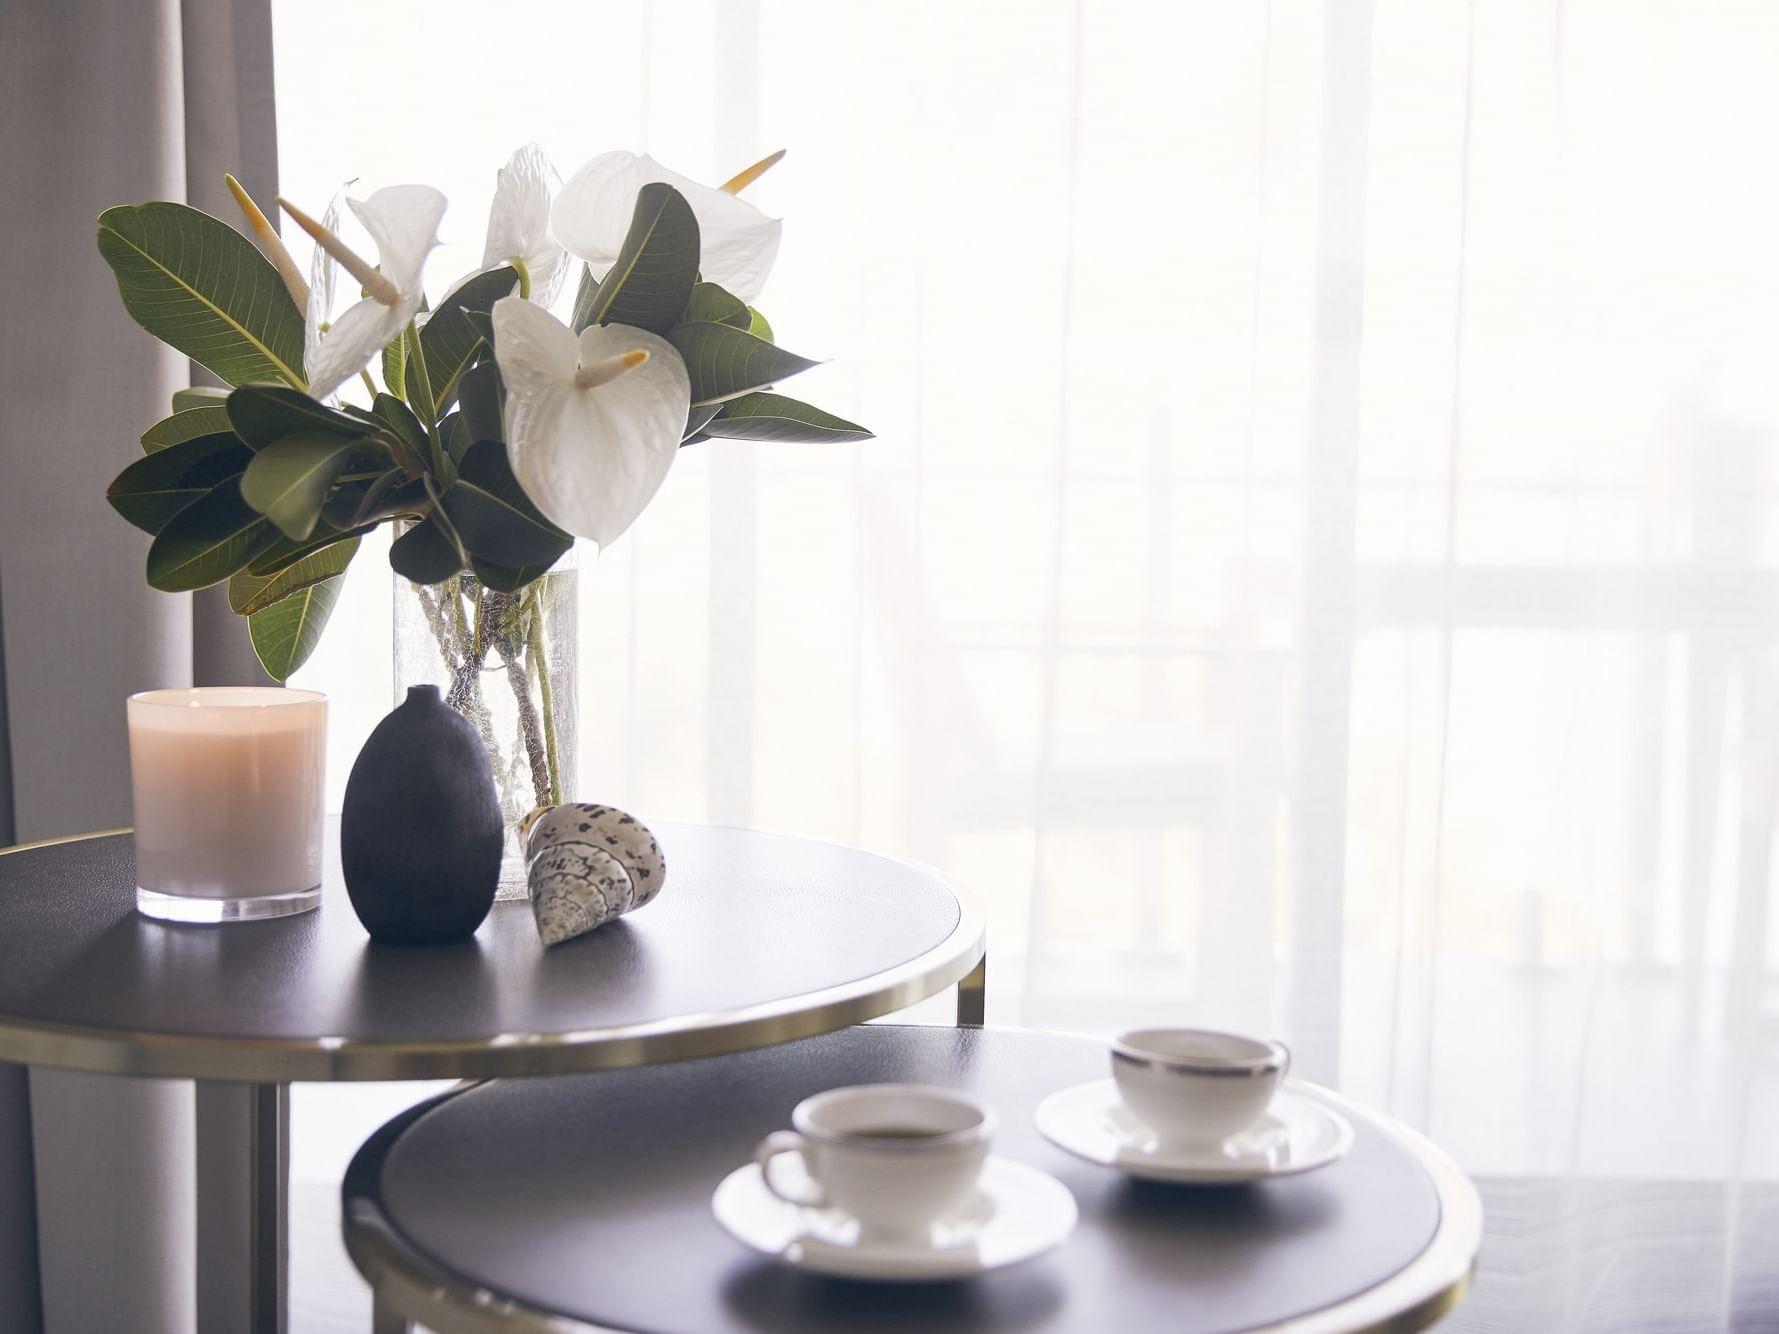 Tea served in Serenity room at Daydream Island Resort